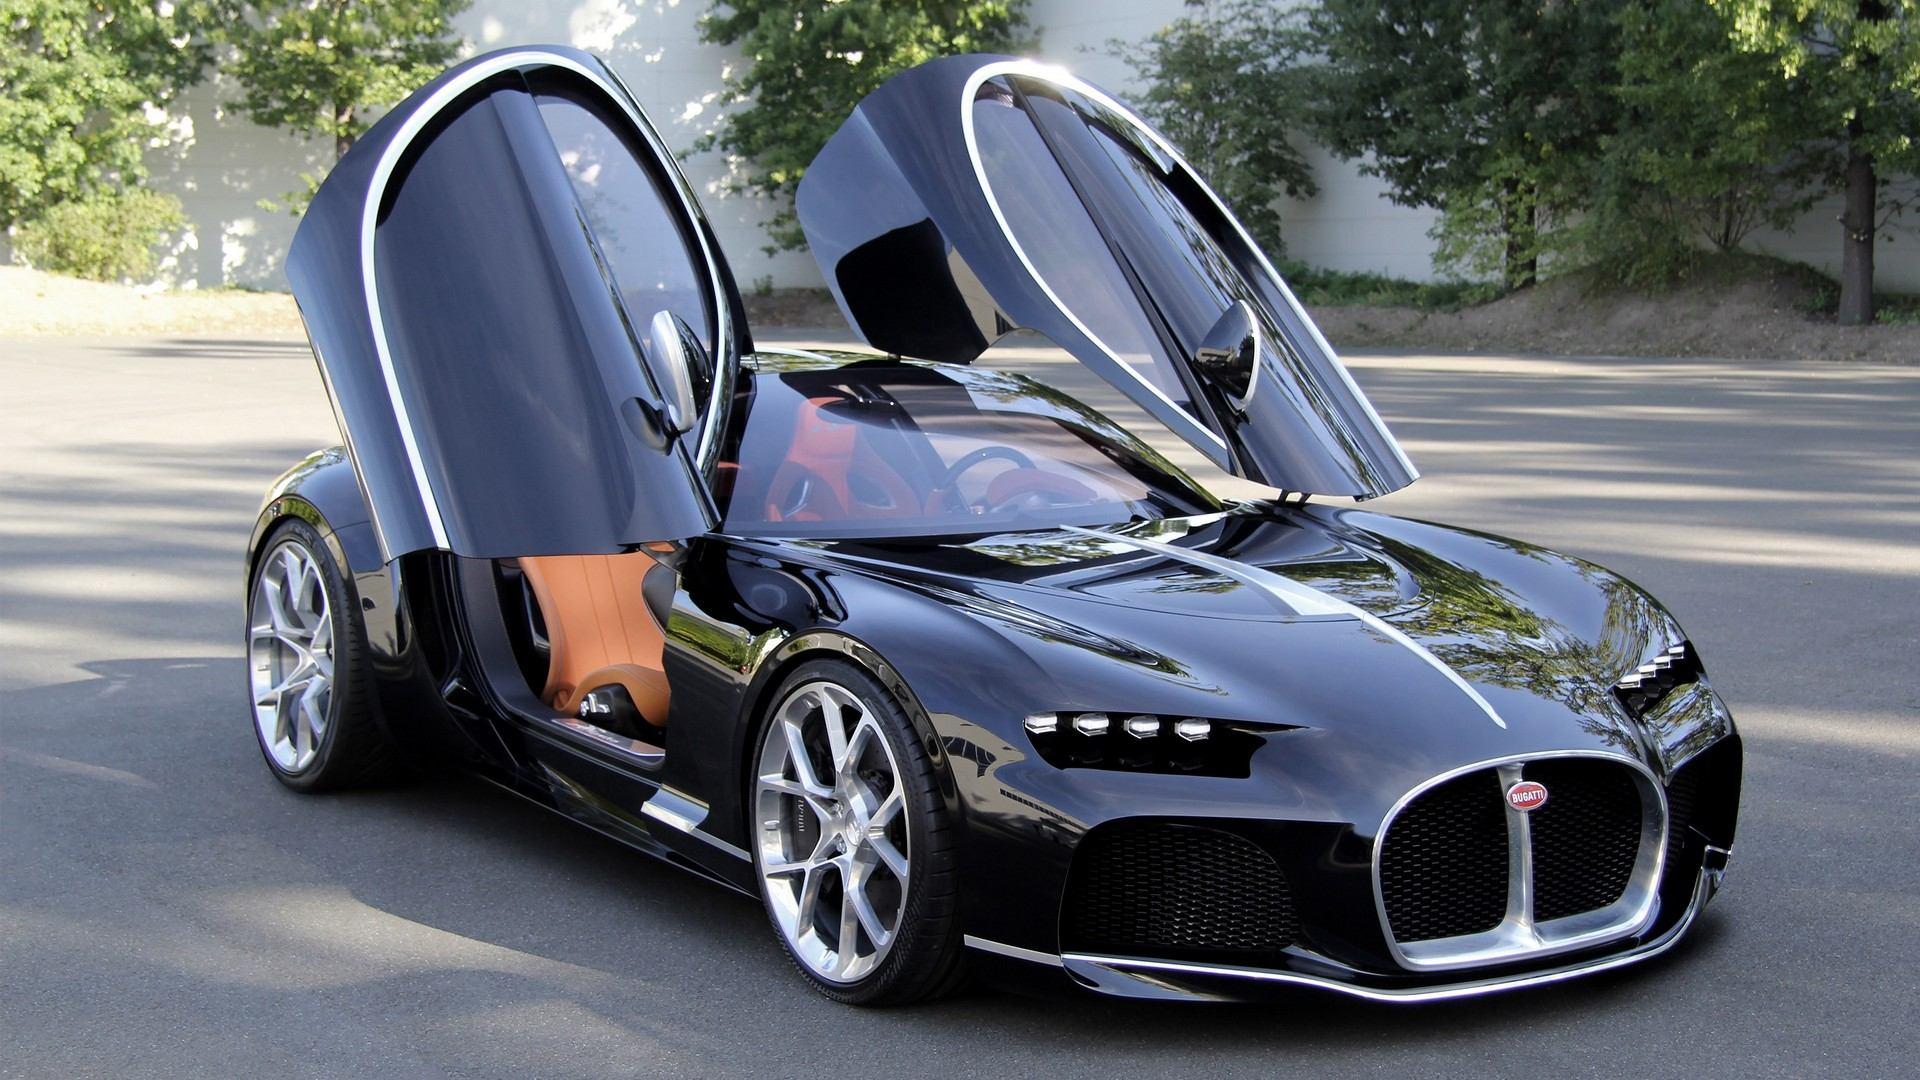 Los prototipos secretos de Bugatti